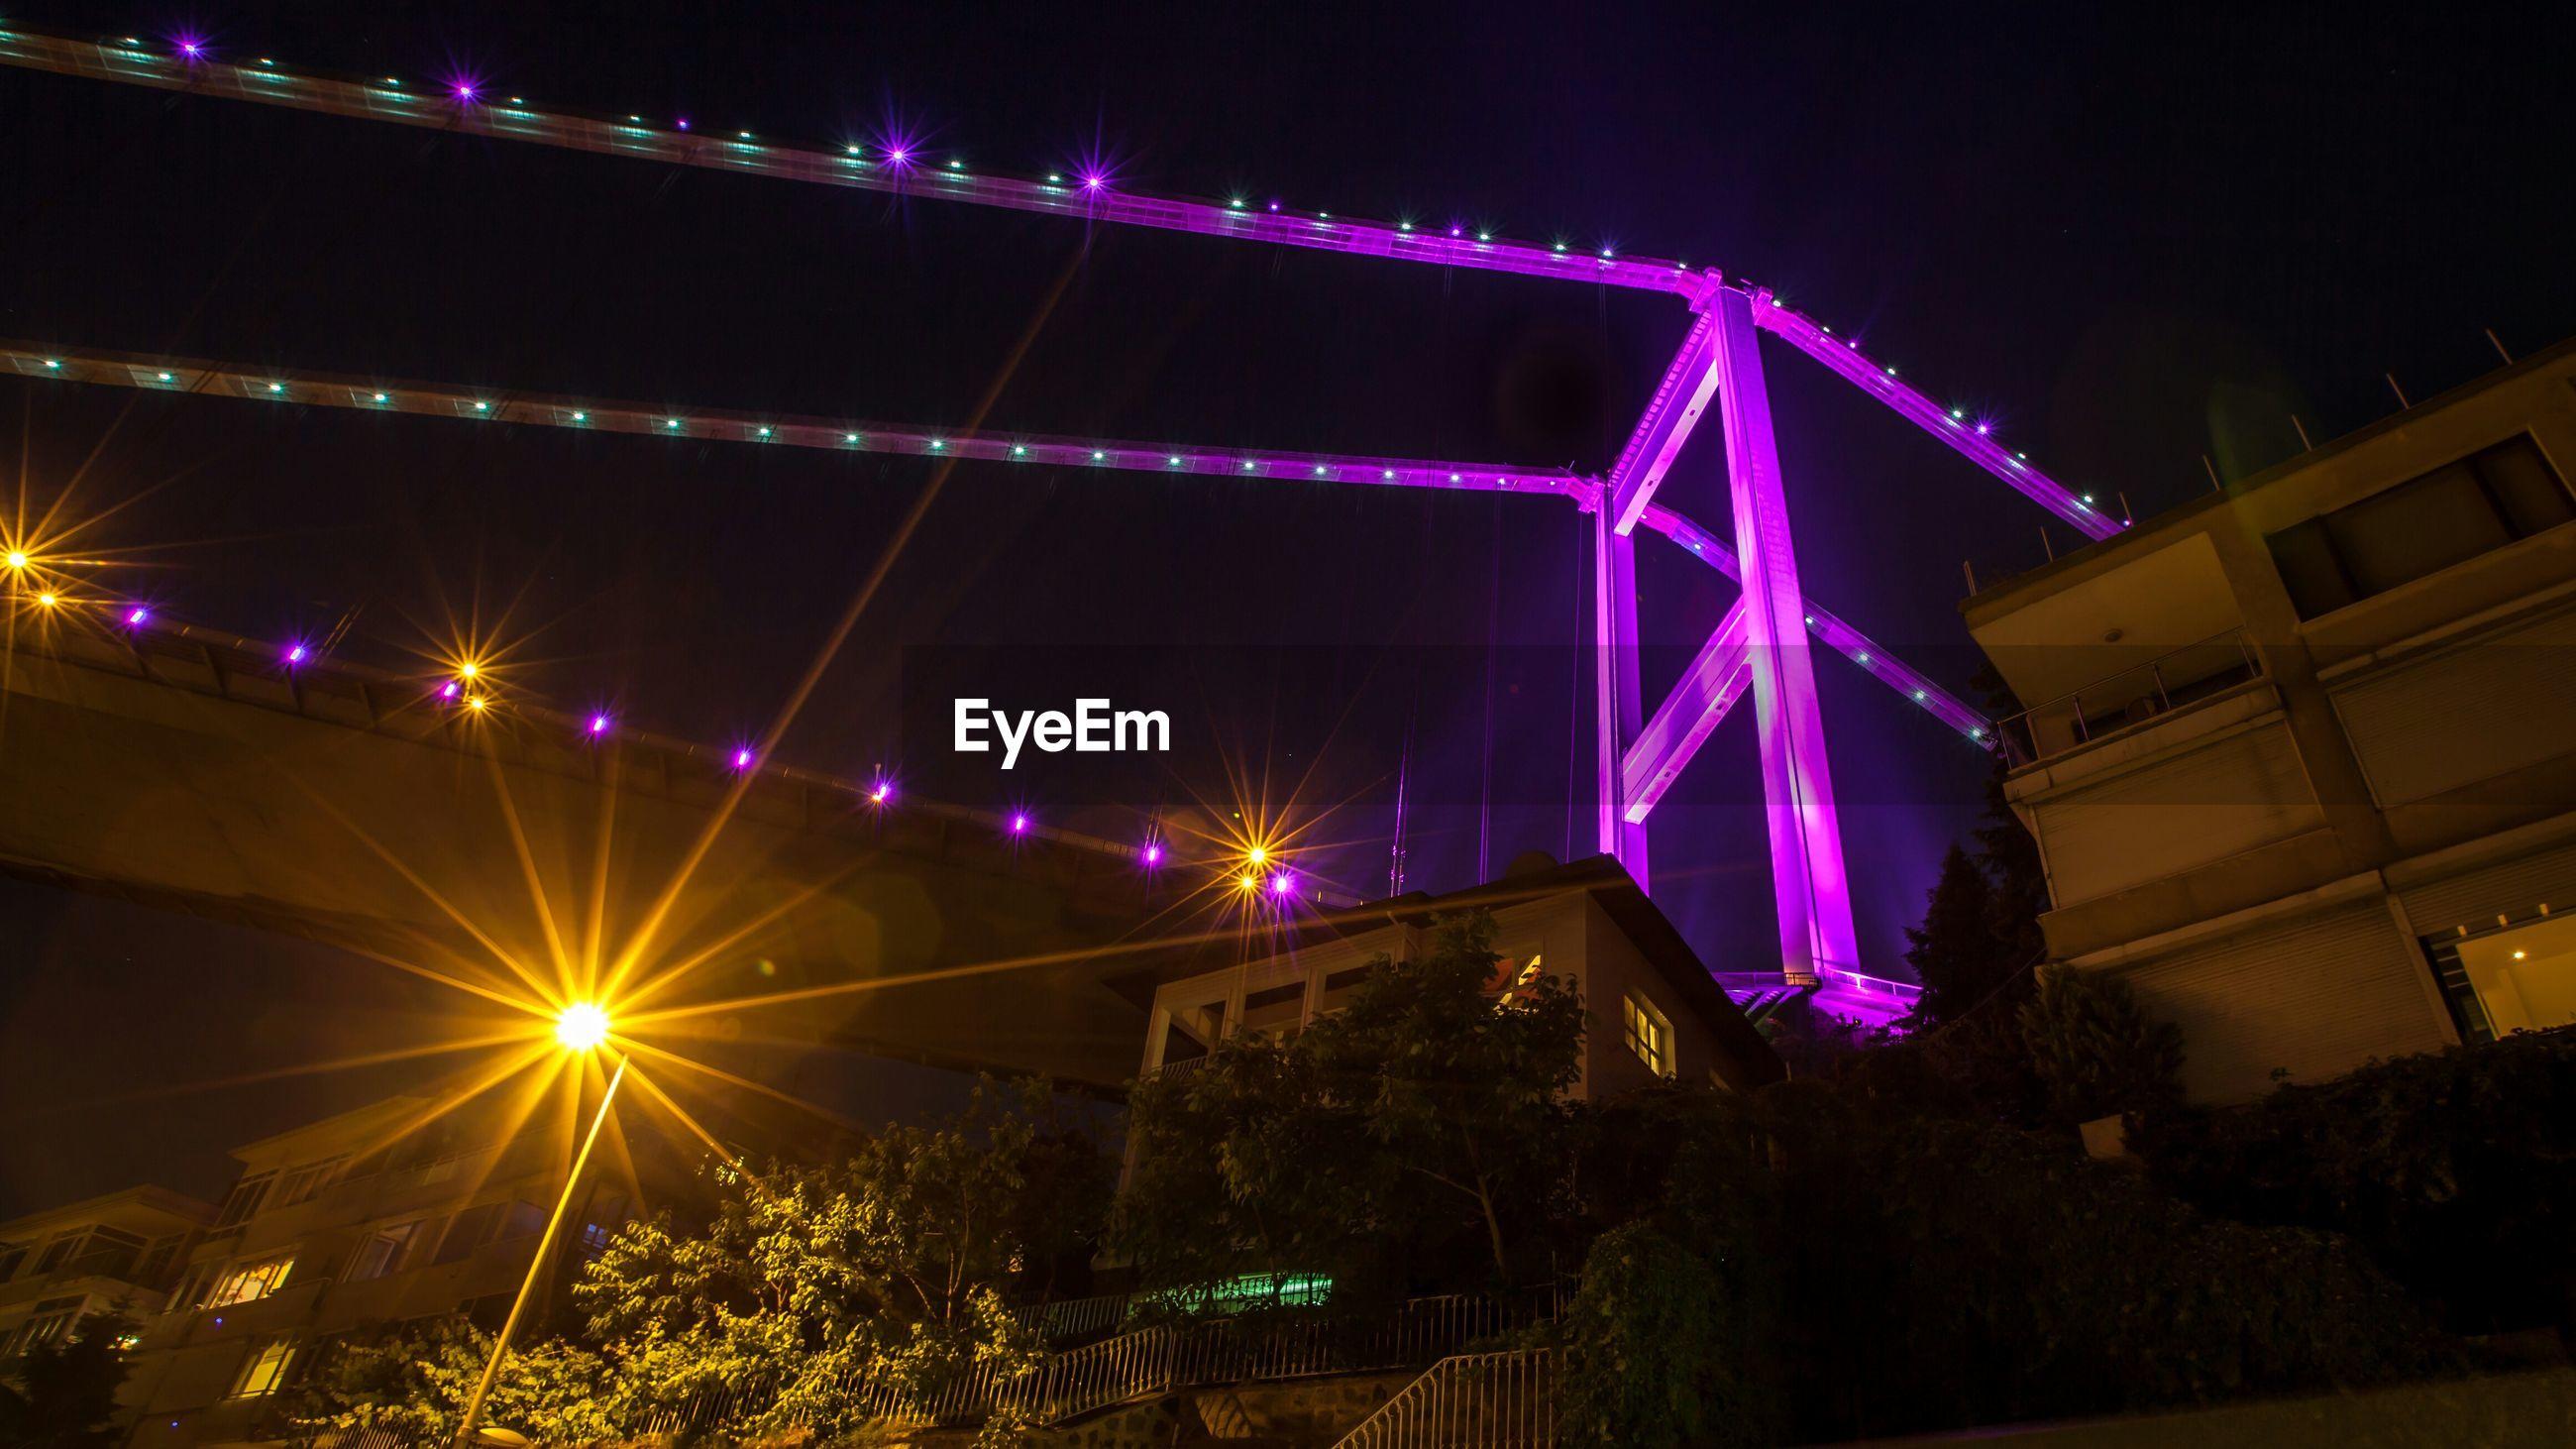 Low angle view of illuminated bosphorus bridge at night